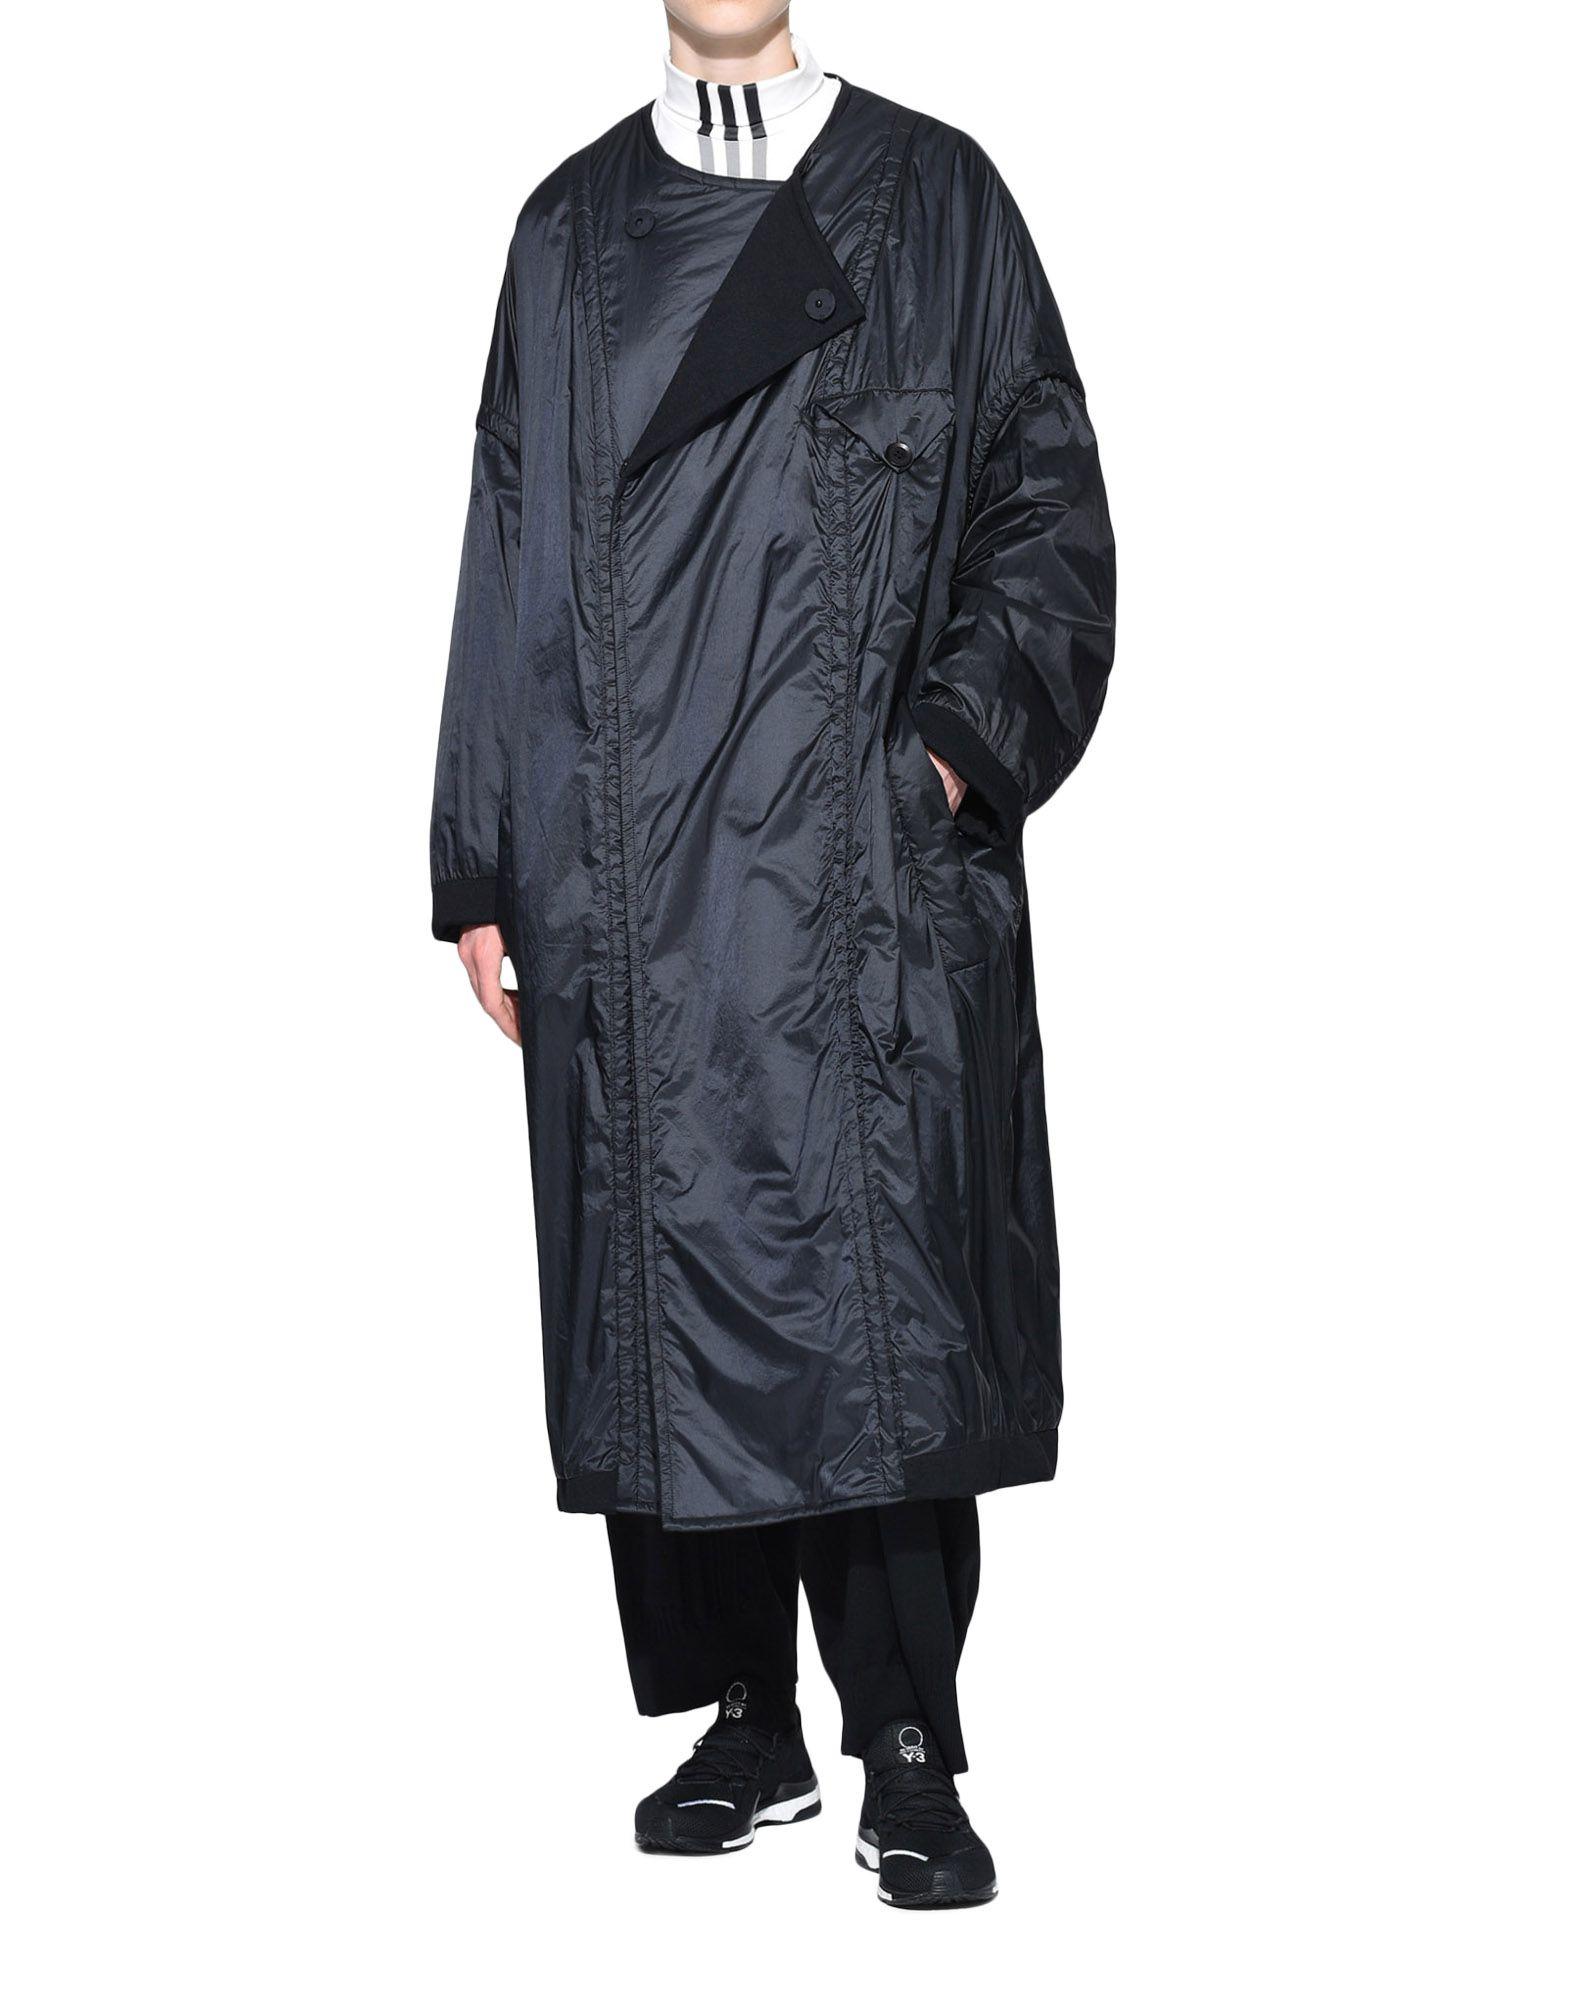 Y-3 Y-3 Oversize Padded Coat Пальто Для Женщин a